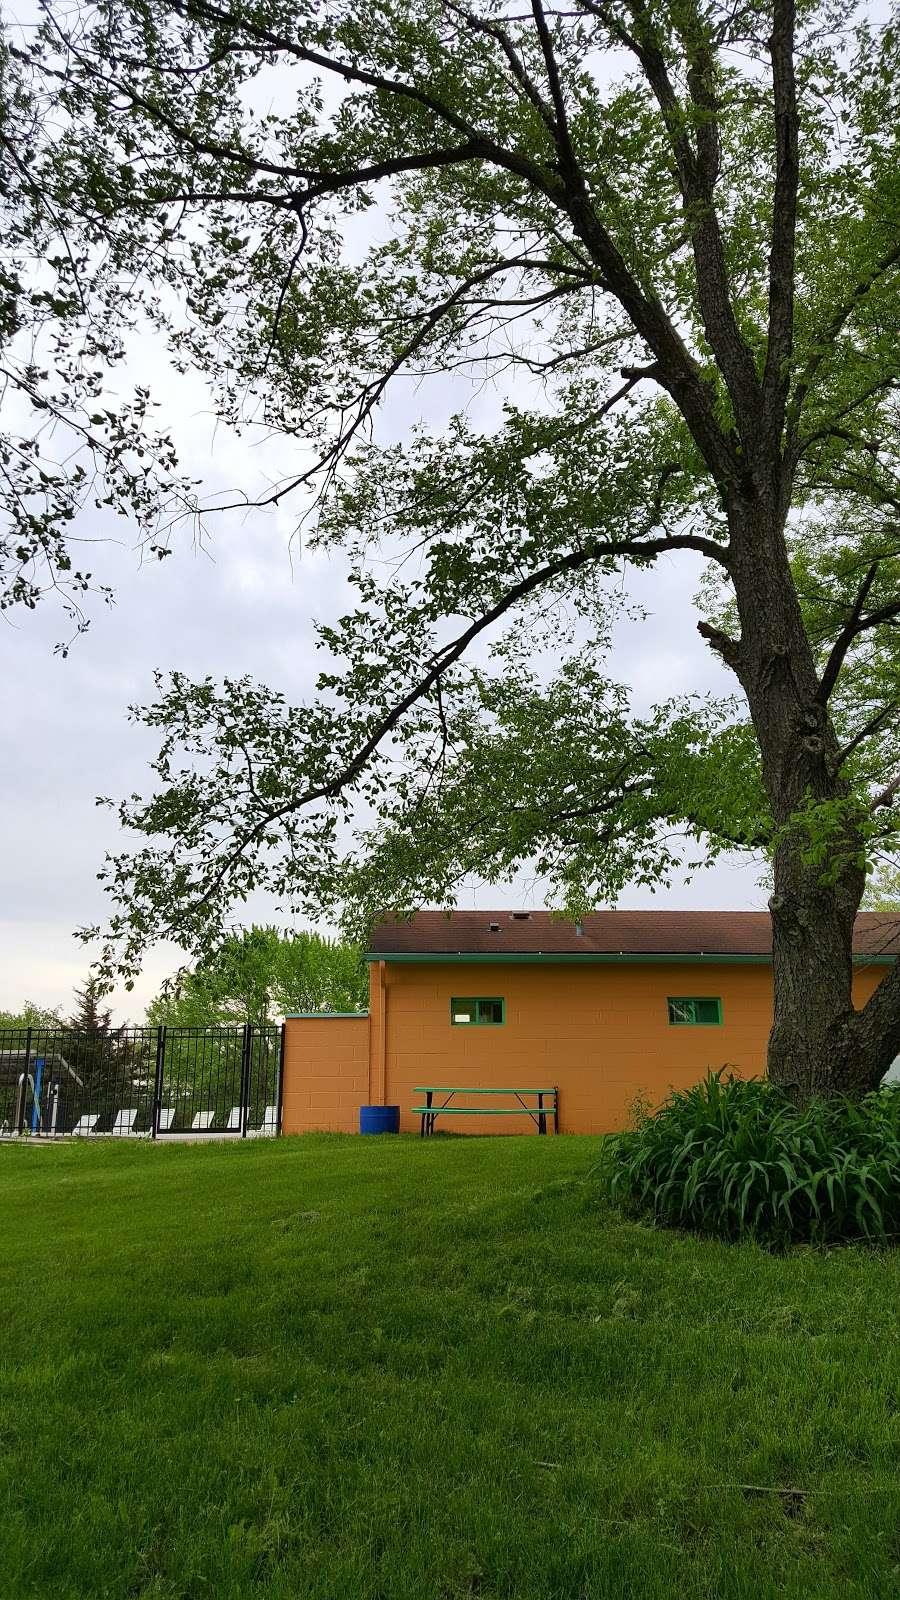 Sun Ray Hills - campground  | Photo 3 of 10 | Address: 7148 McHenry St, Burlington, WI 53105, USA | Phone: (262) 539-2592